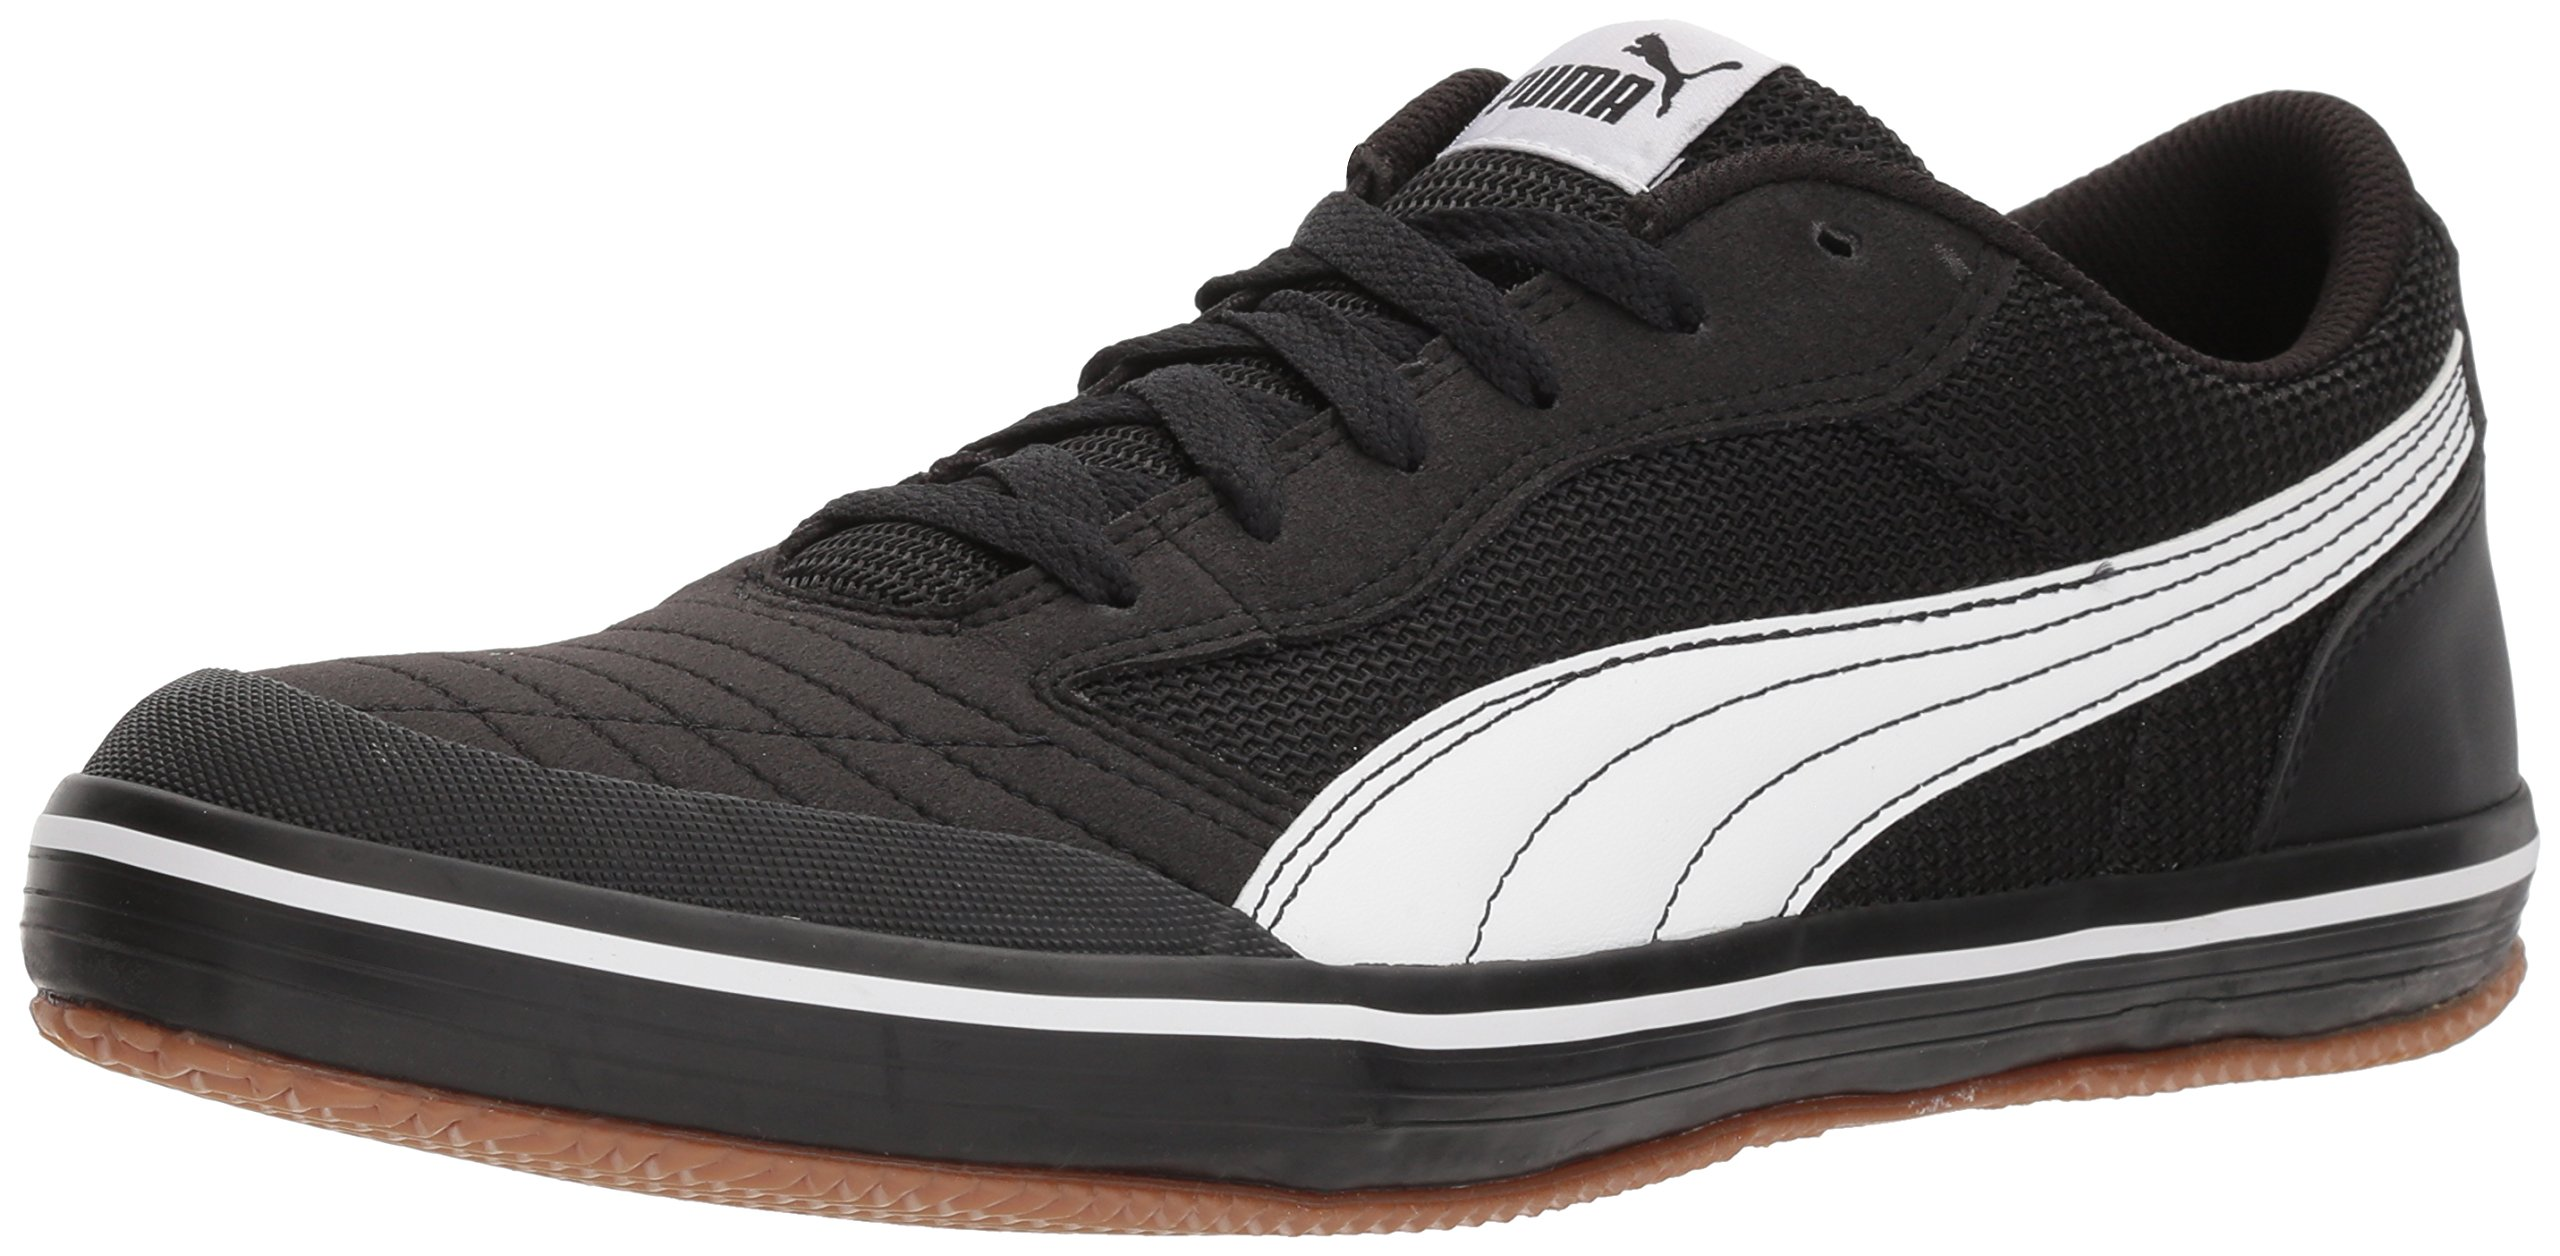 PUMA Men's Astro Sala Sneaker- Buy